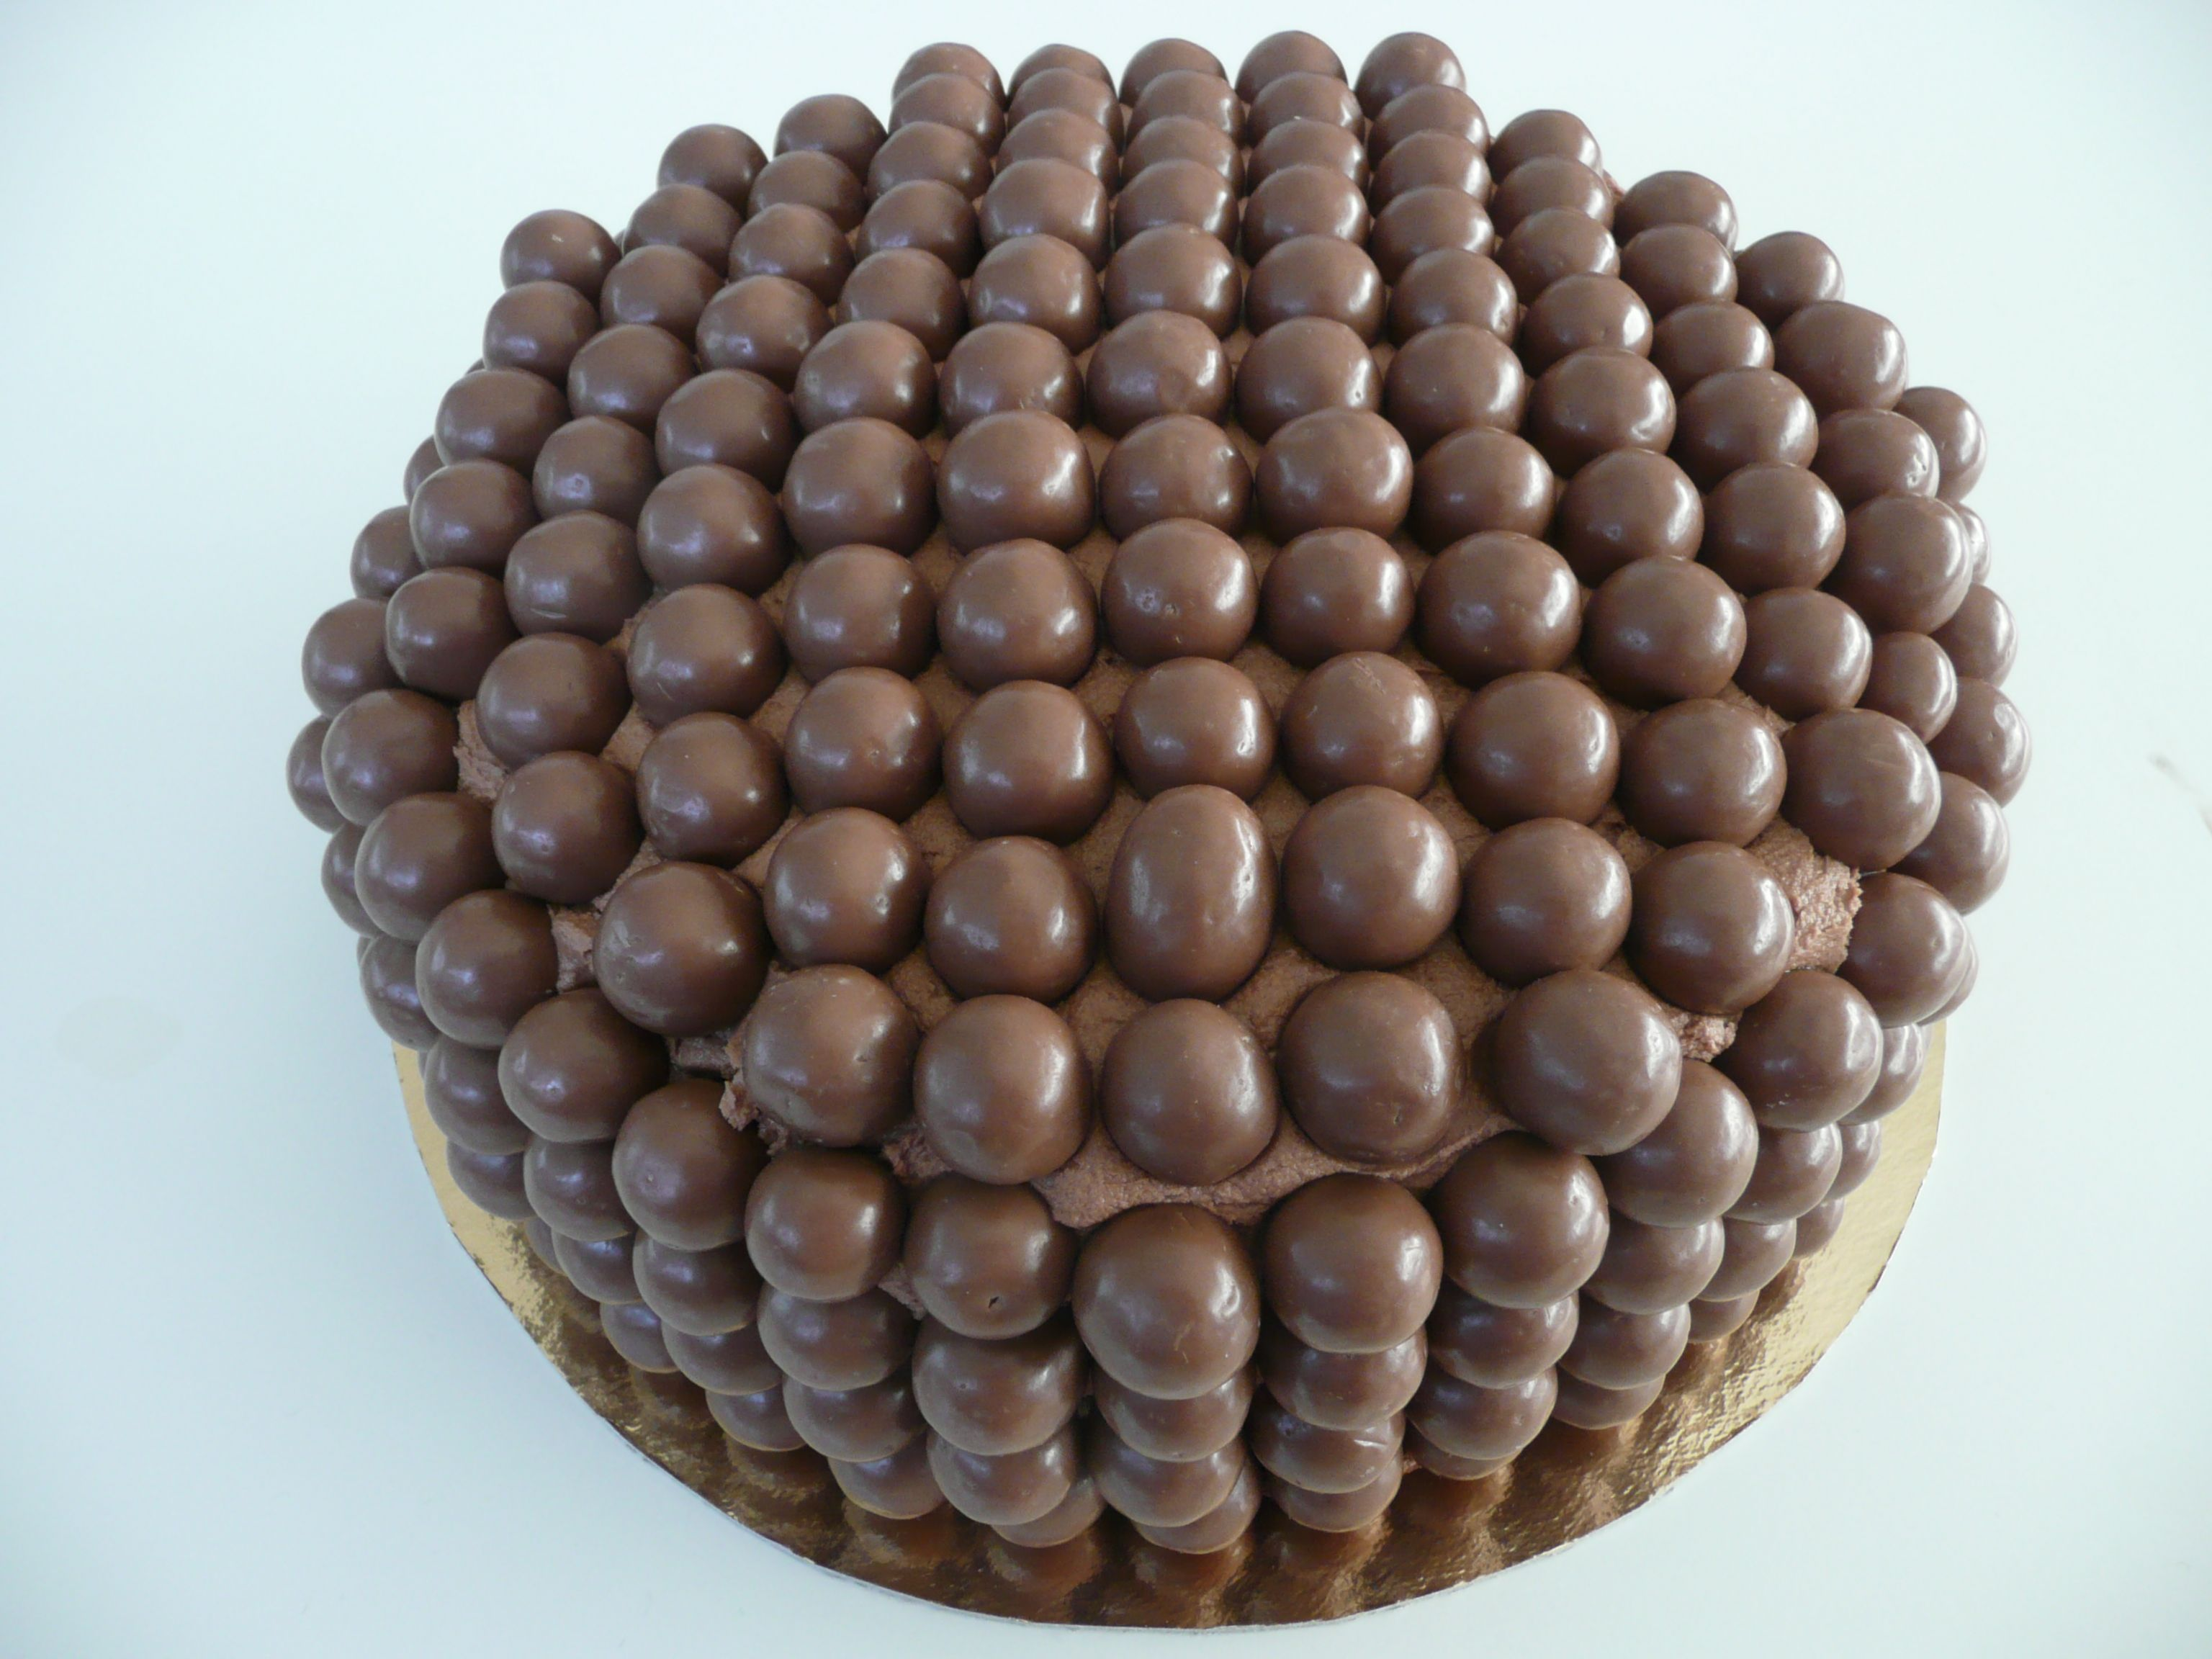 Lorraine Pascale Flourless Chocolate Cake